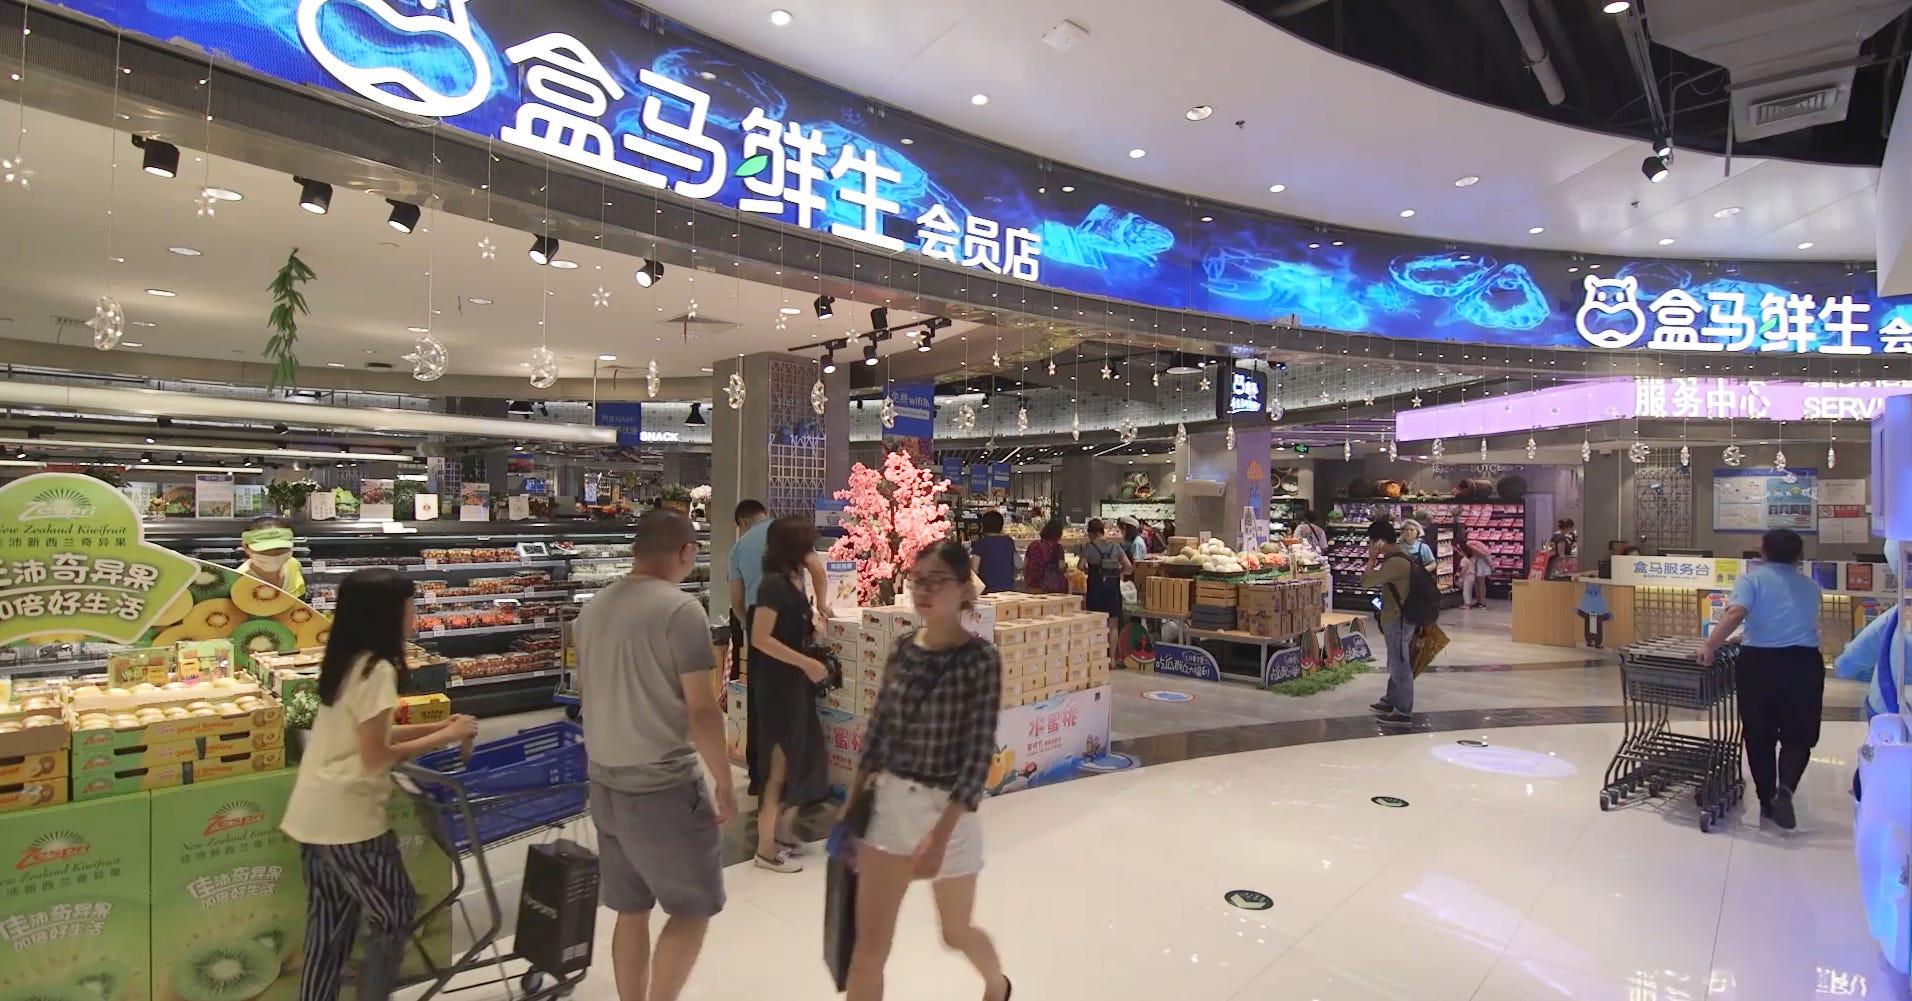 A Hema supermarket in China